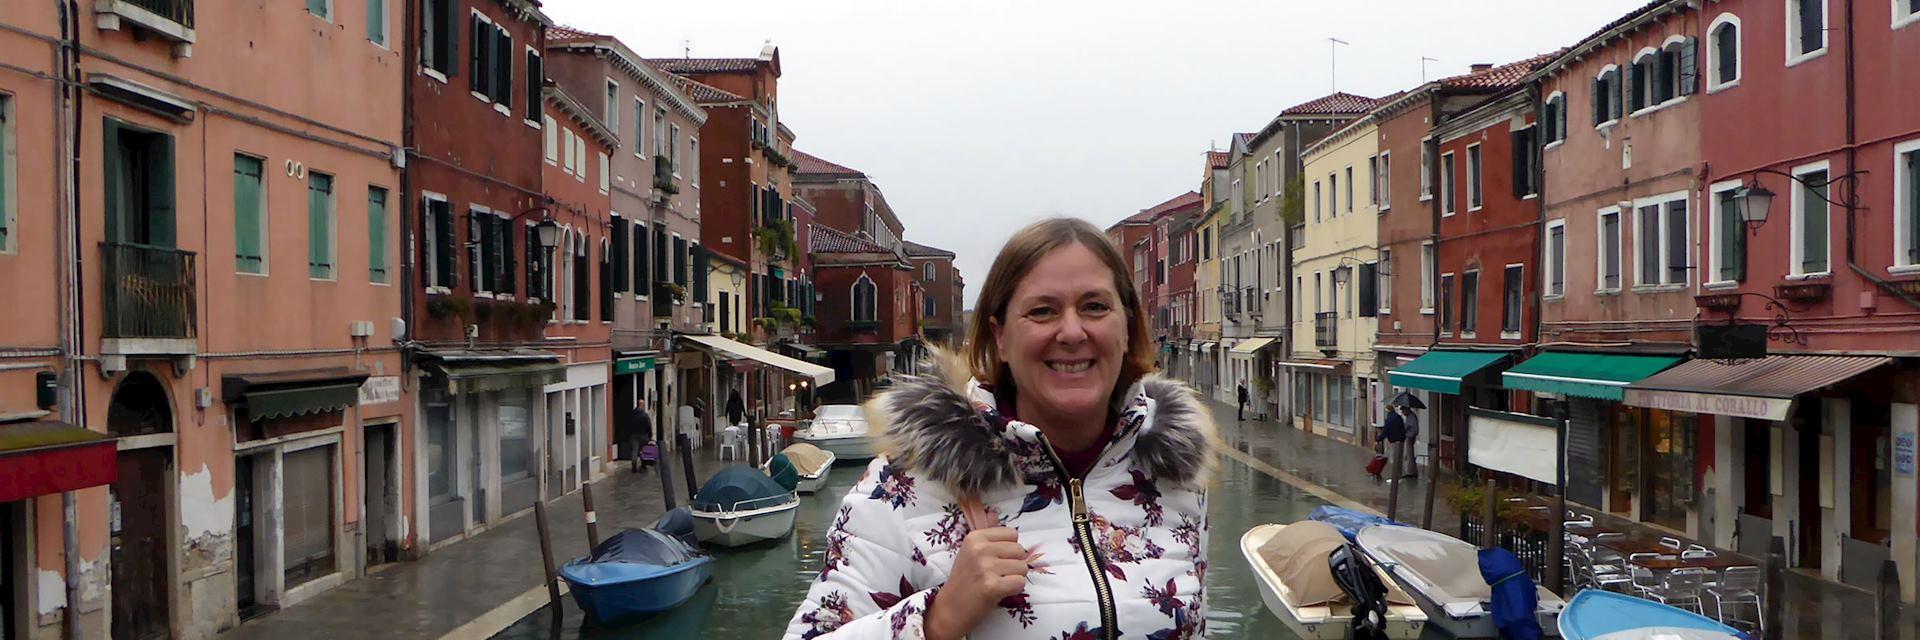 Carolyn in Burano, Venice